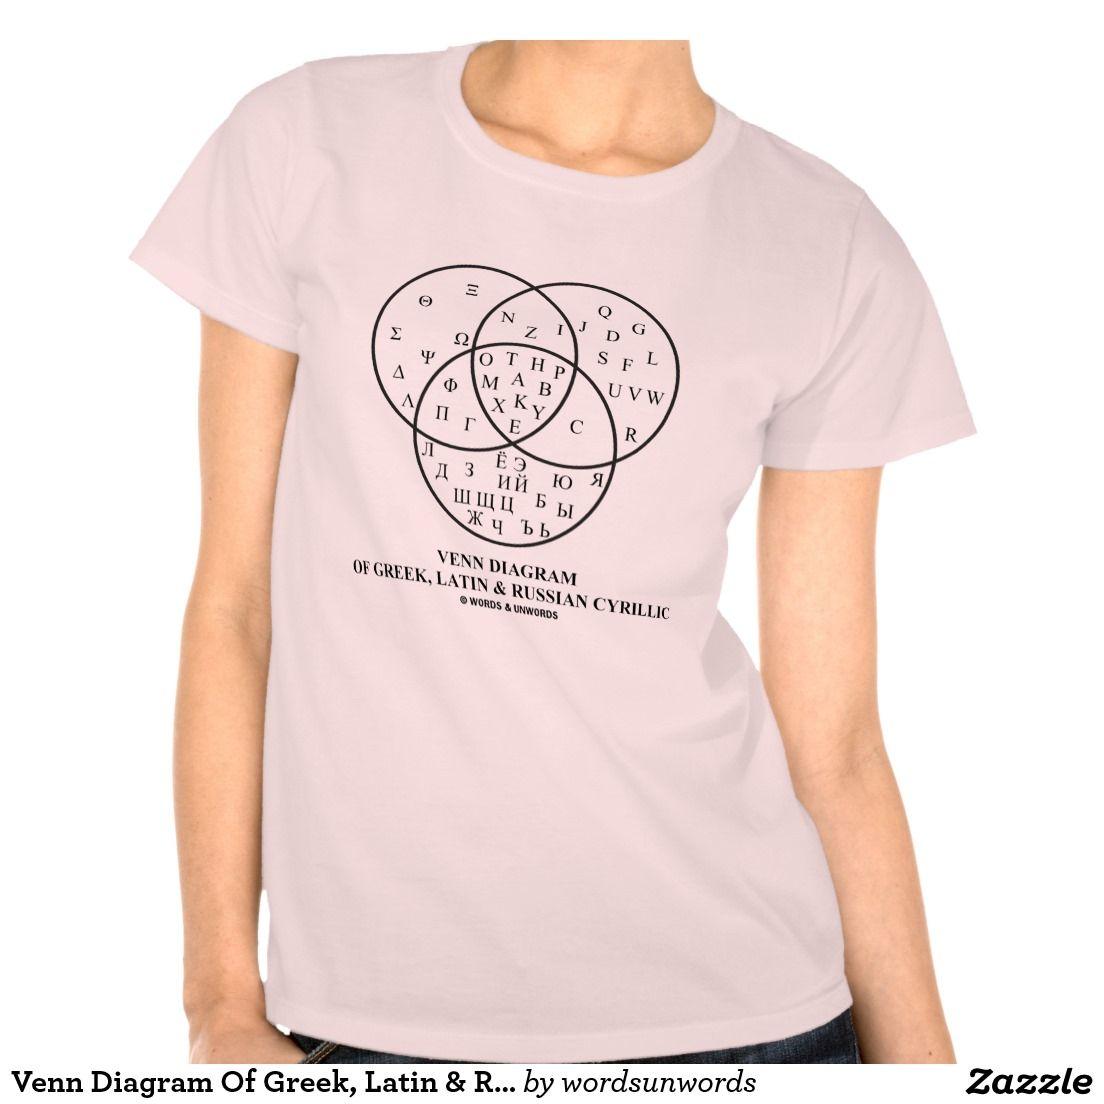 Venn diagram of greek latin russian cyrillic tees math venn diagram of greek latin russian cyrillic tees math geometry venndiagram graphic t shirtsvenn pooptronica